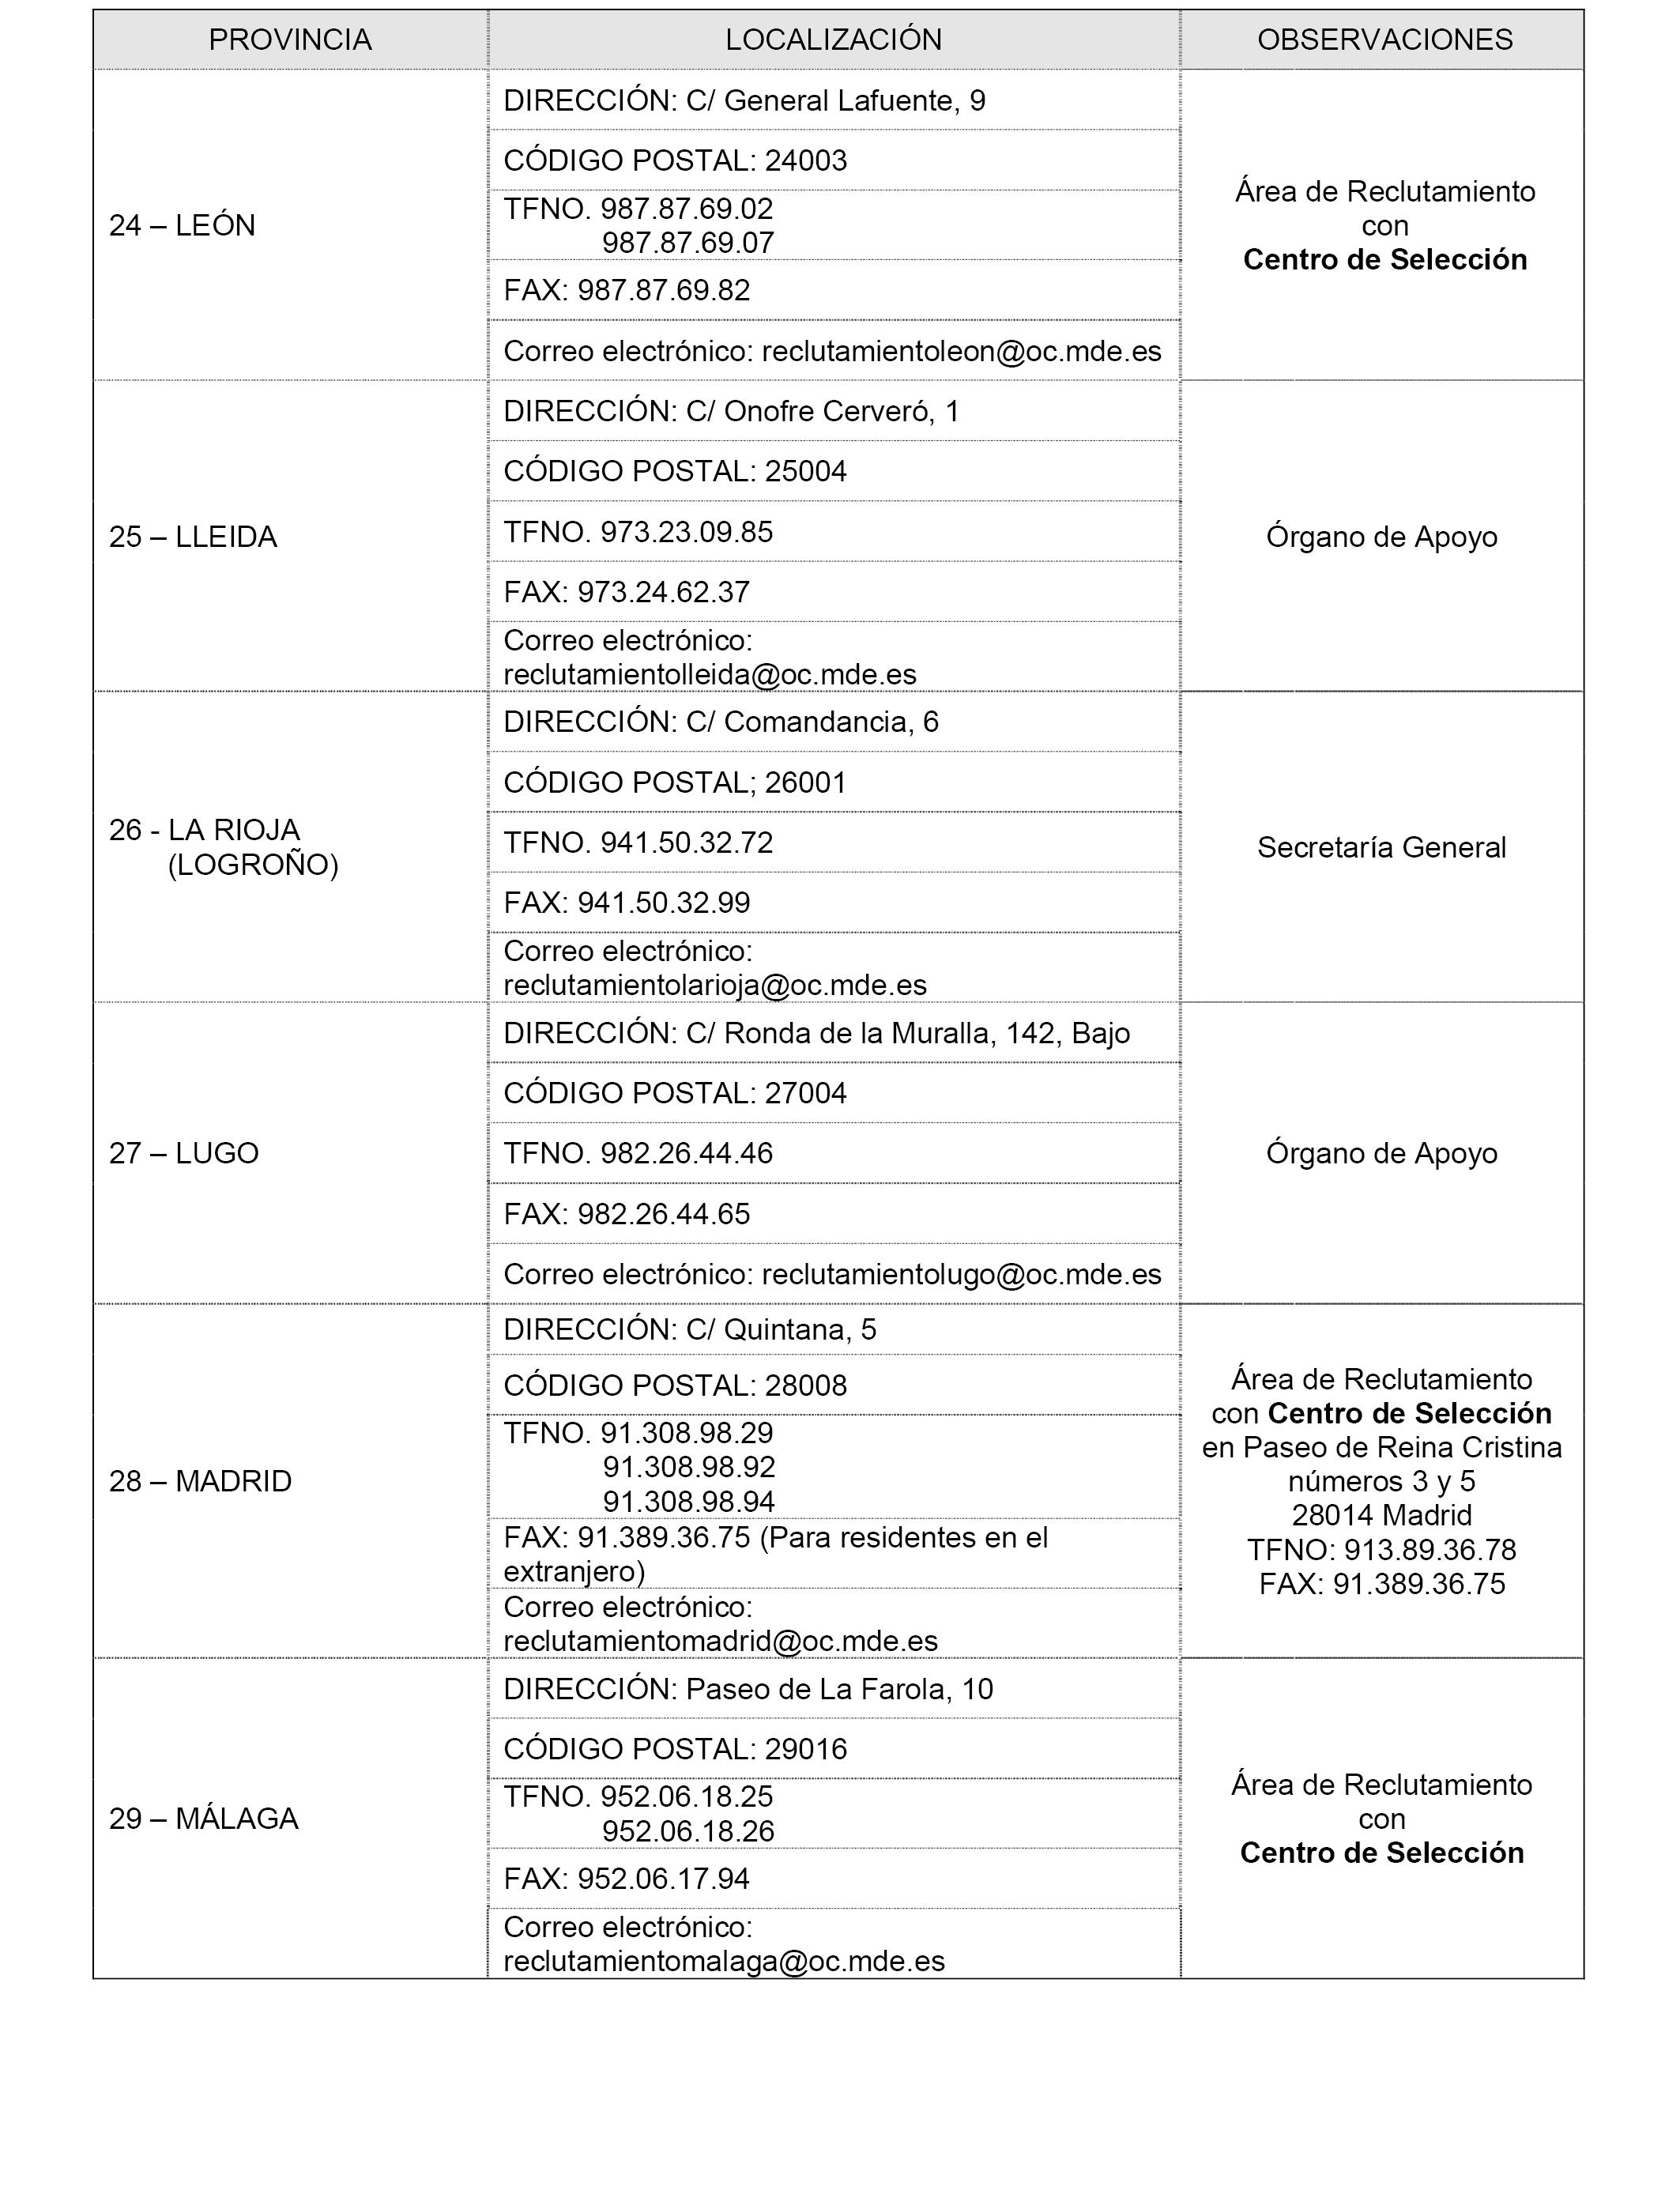 BOE.es - Documento BOE-A-2016-9032